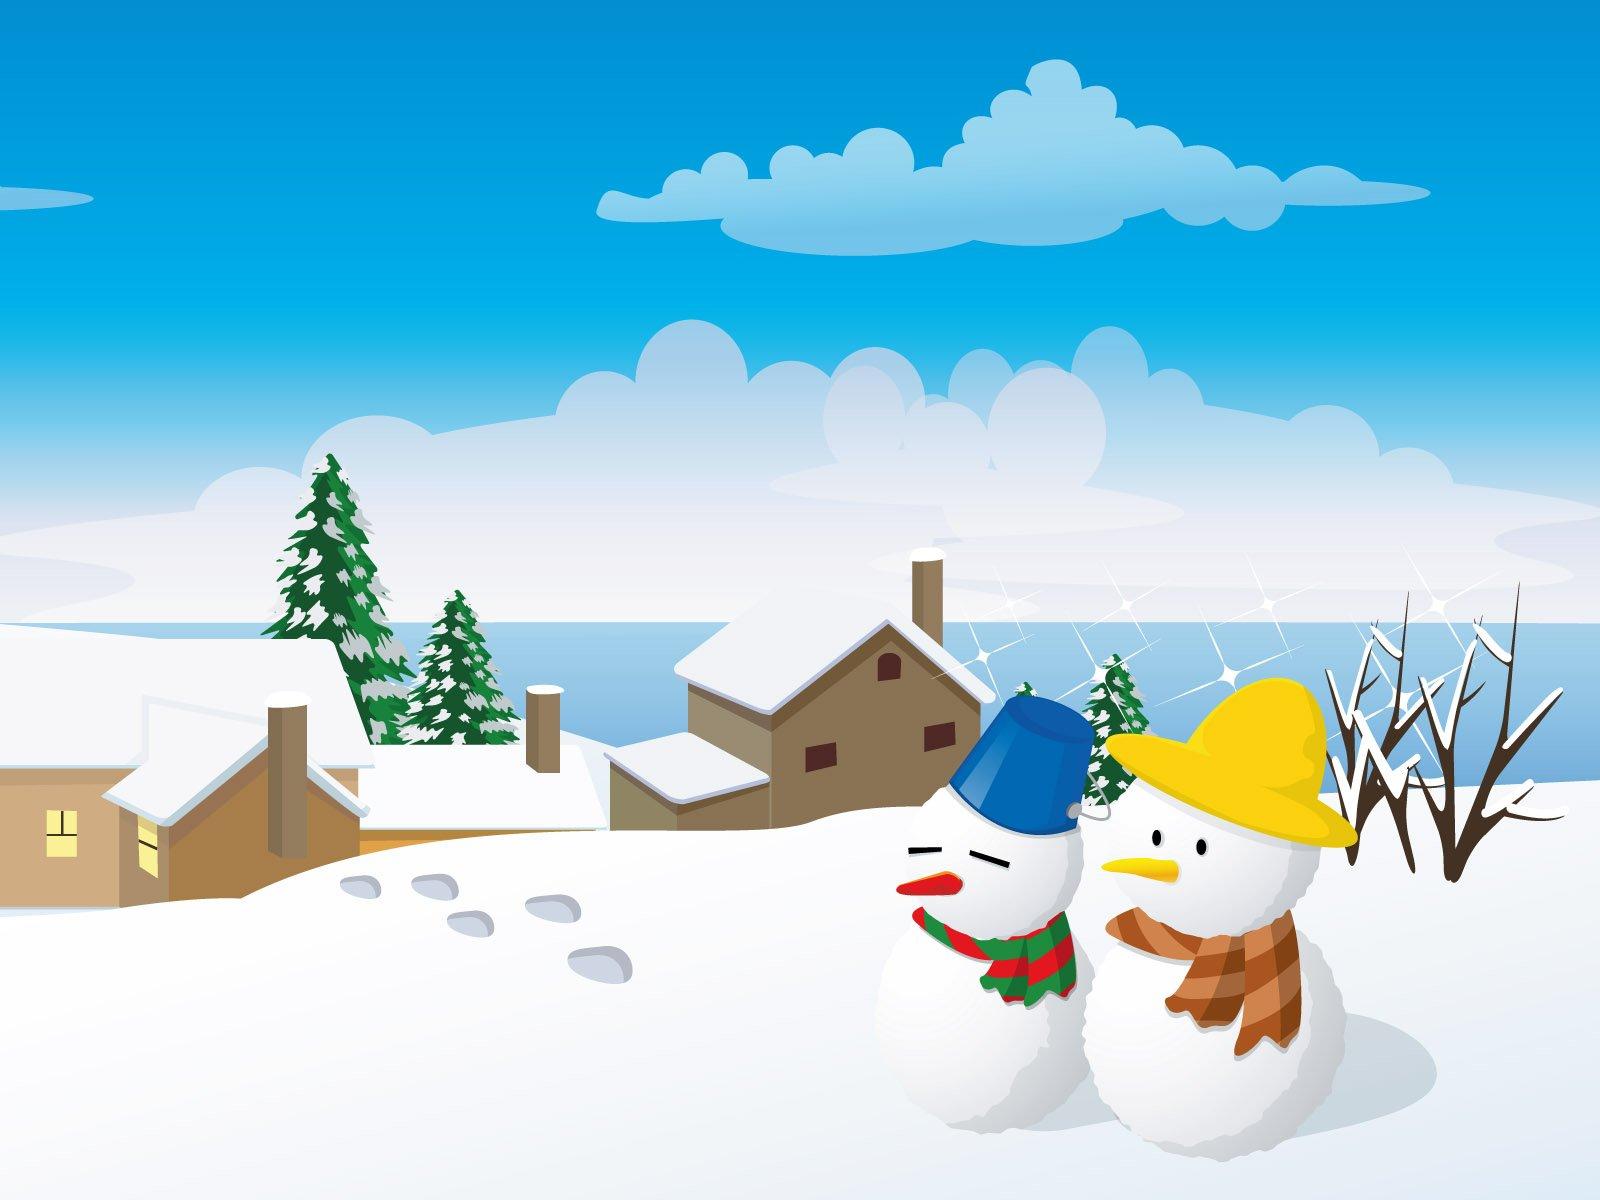 48+ Cartoon Winter Wallpaper on WallpaperSafari